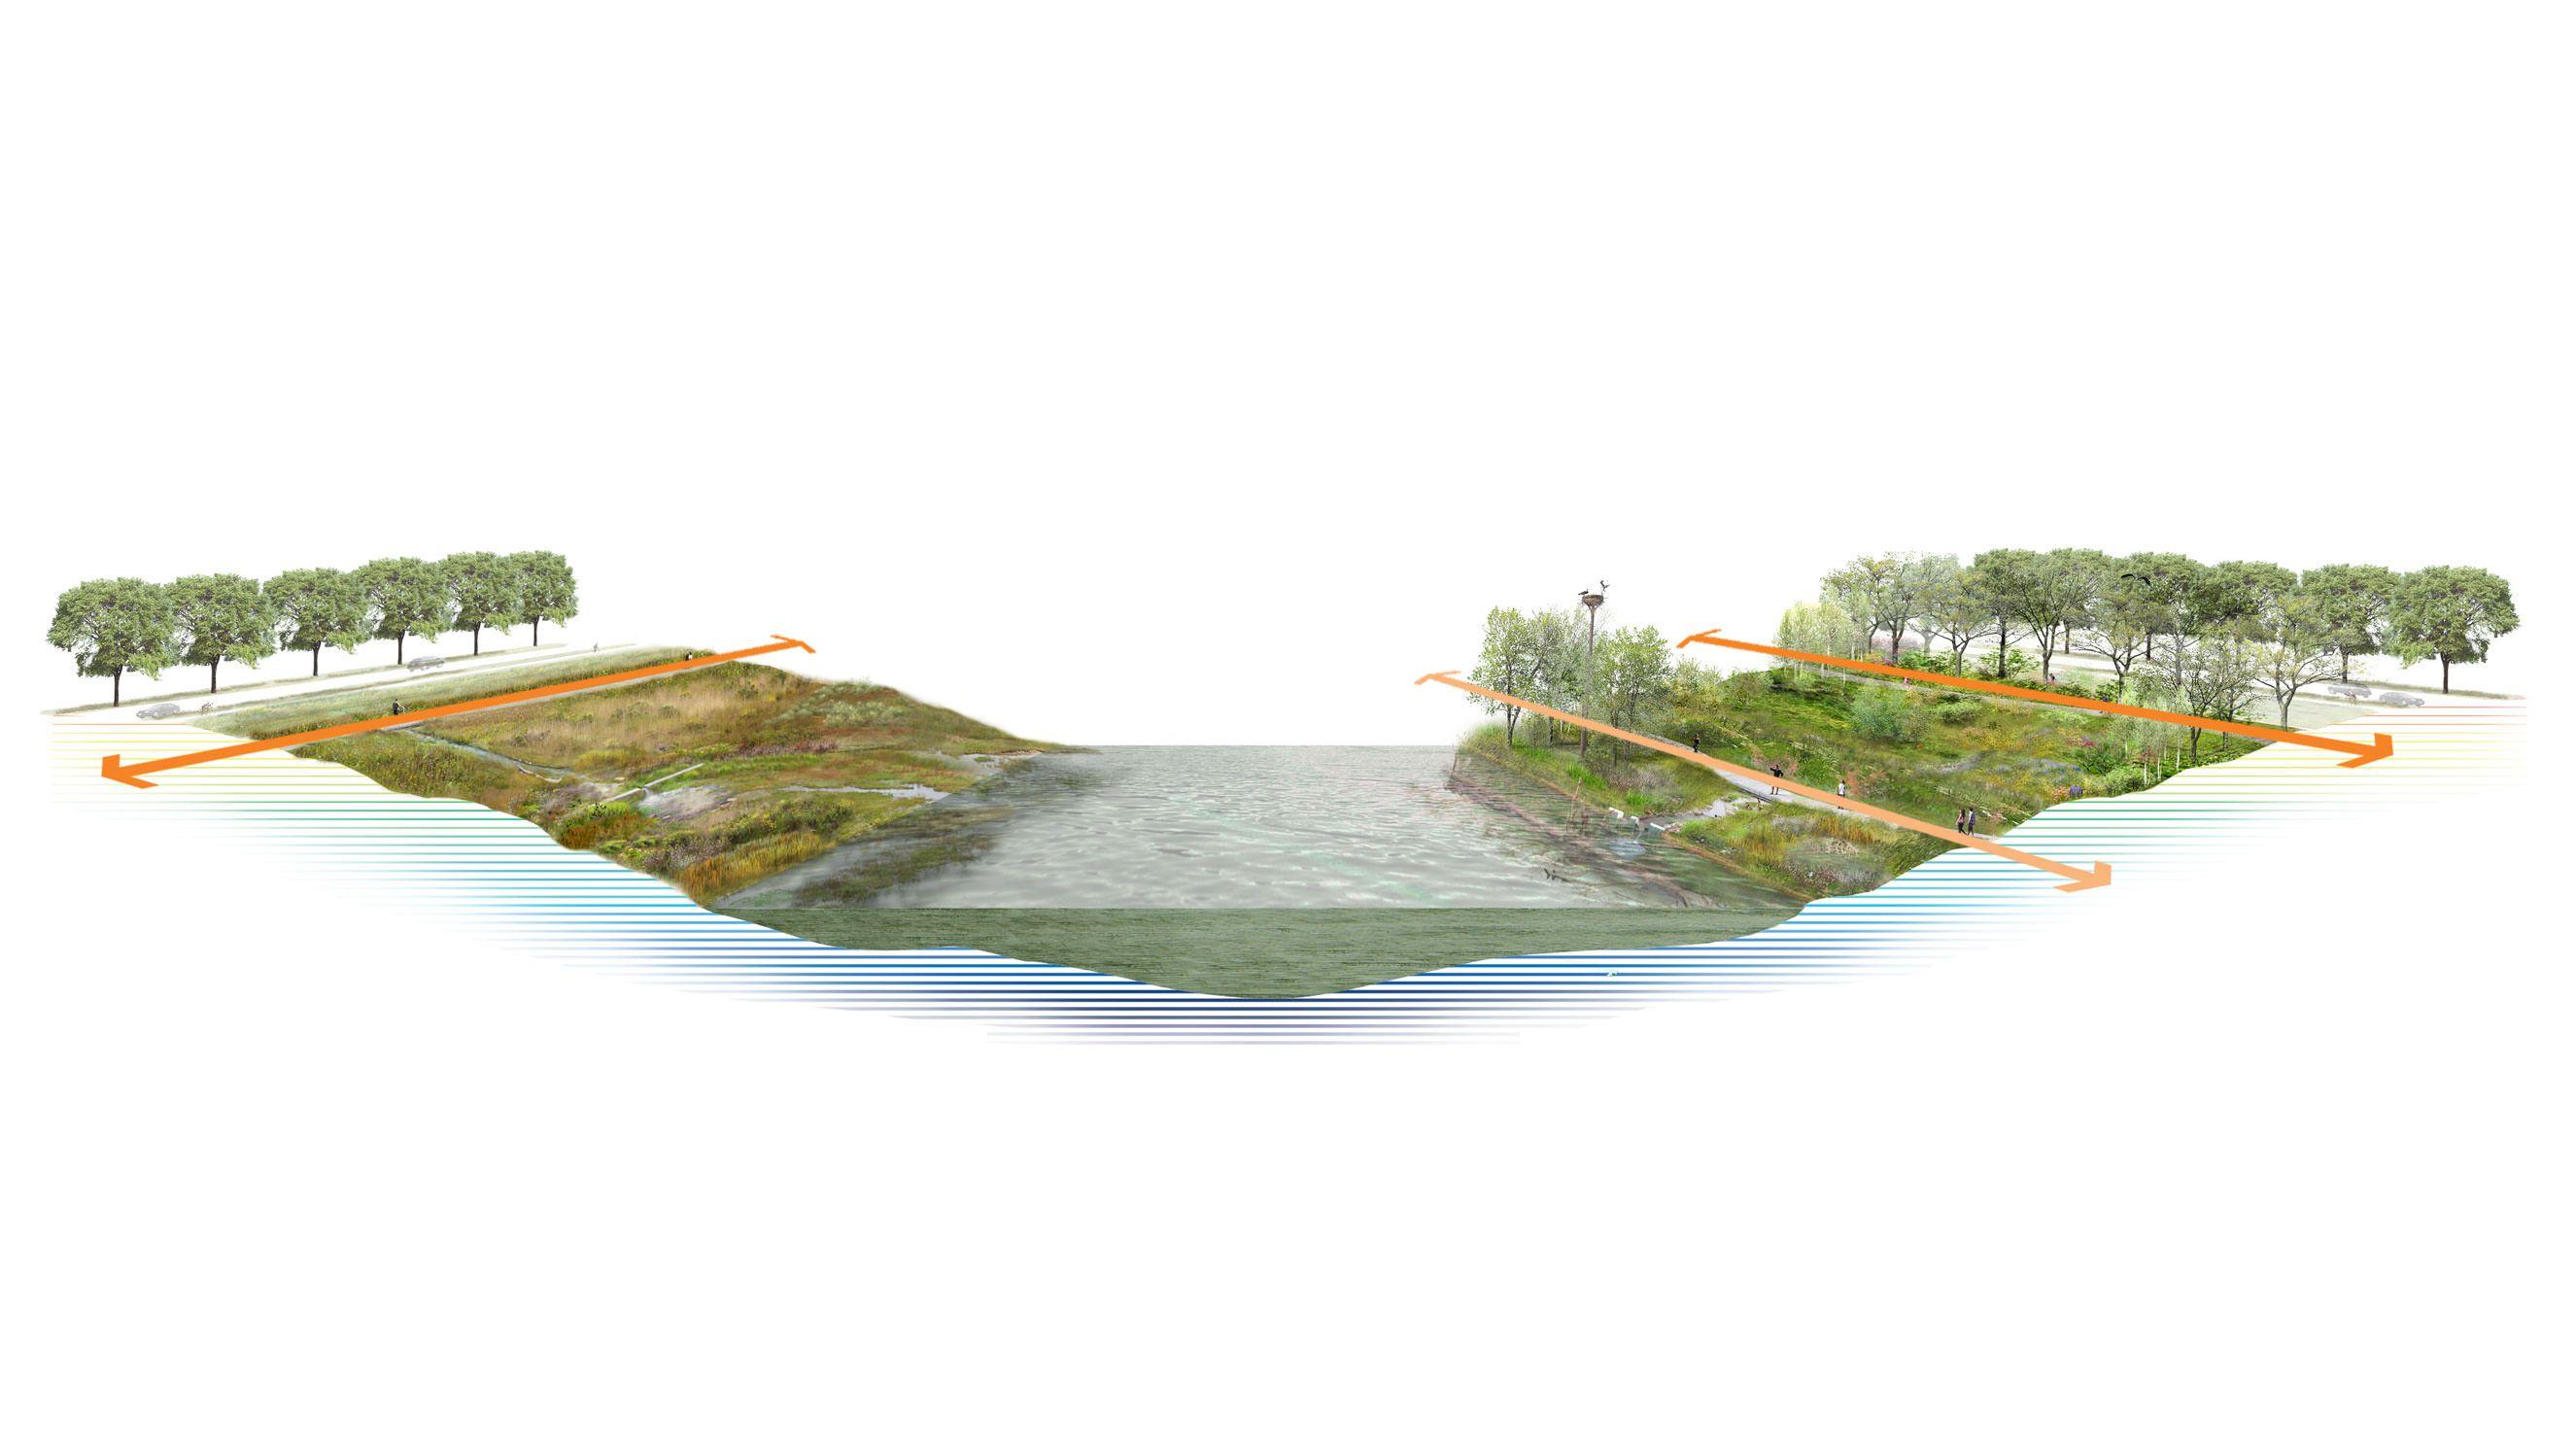 Riverfirst Tls Landscape Architecture Landscape Architecture Design Landscape Architecture Perspective Landscape Architecture Section